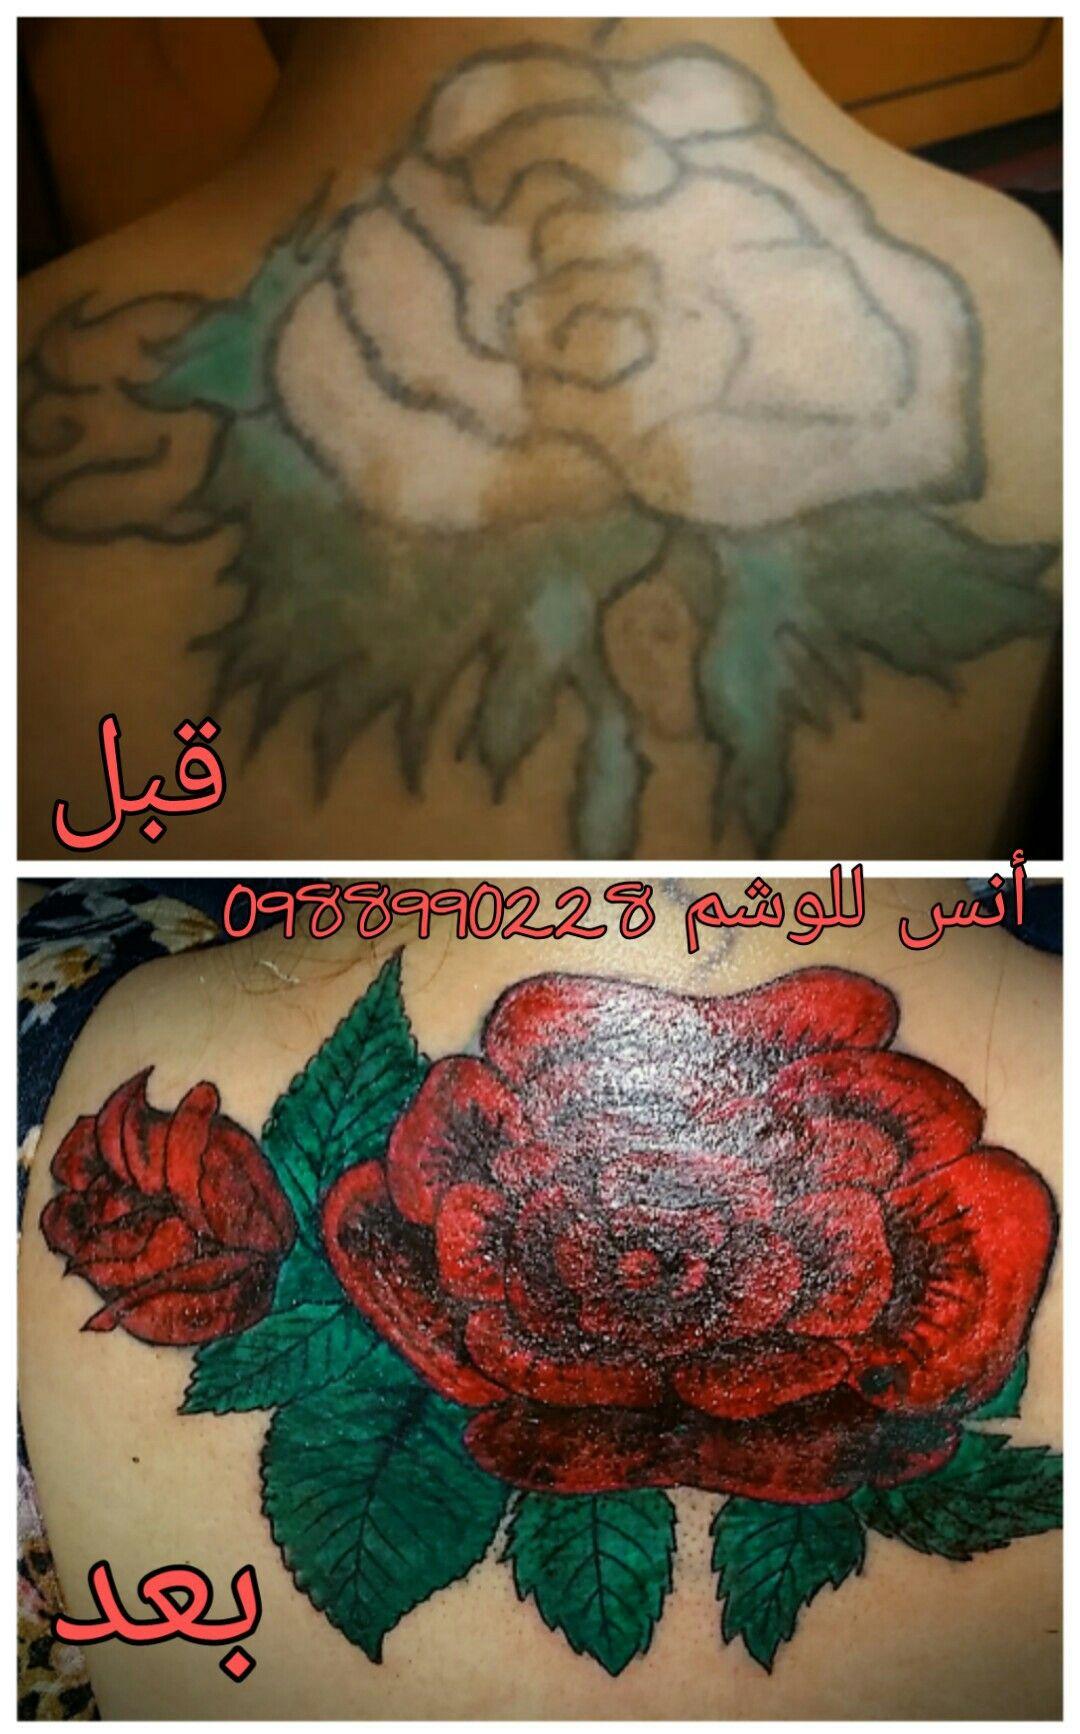 Pin By أنس للوشم Anas For Tattoo On تغطية تعديل وشم تاتو قديم Tattoos Cover Up